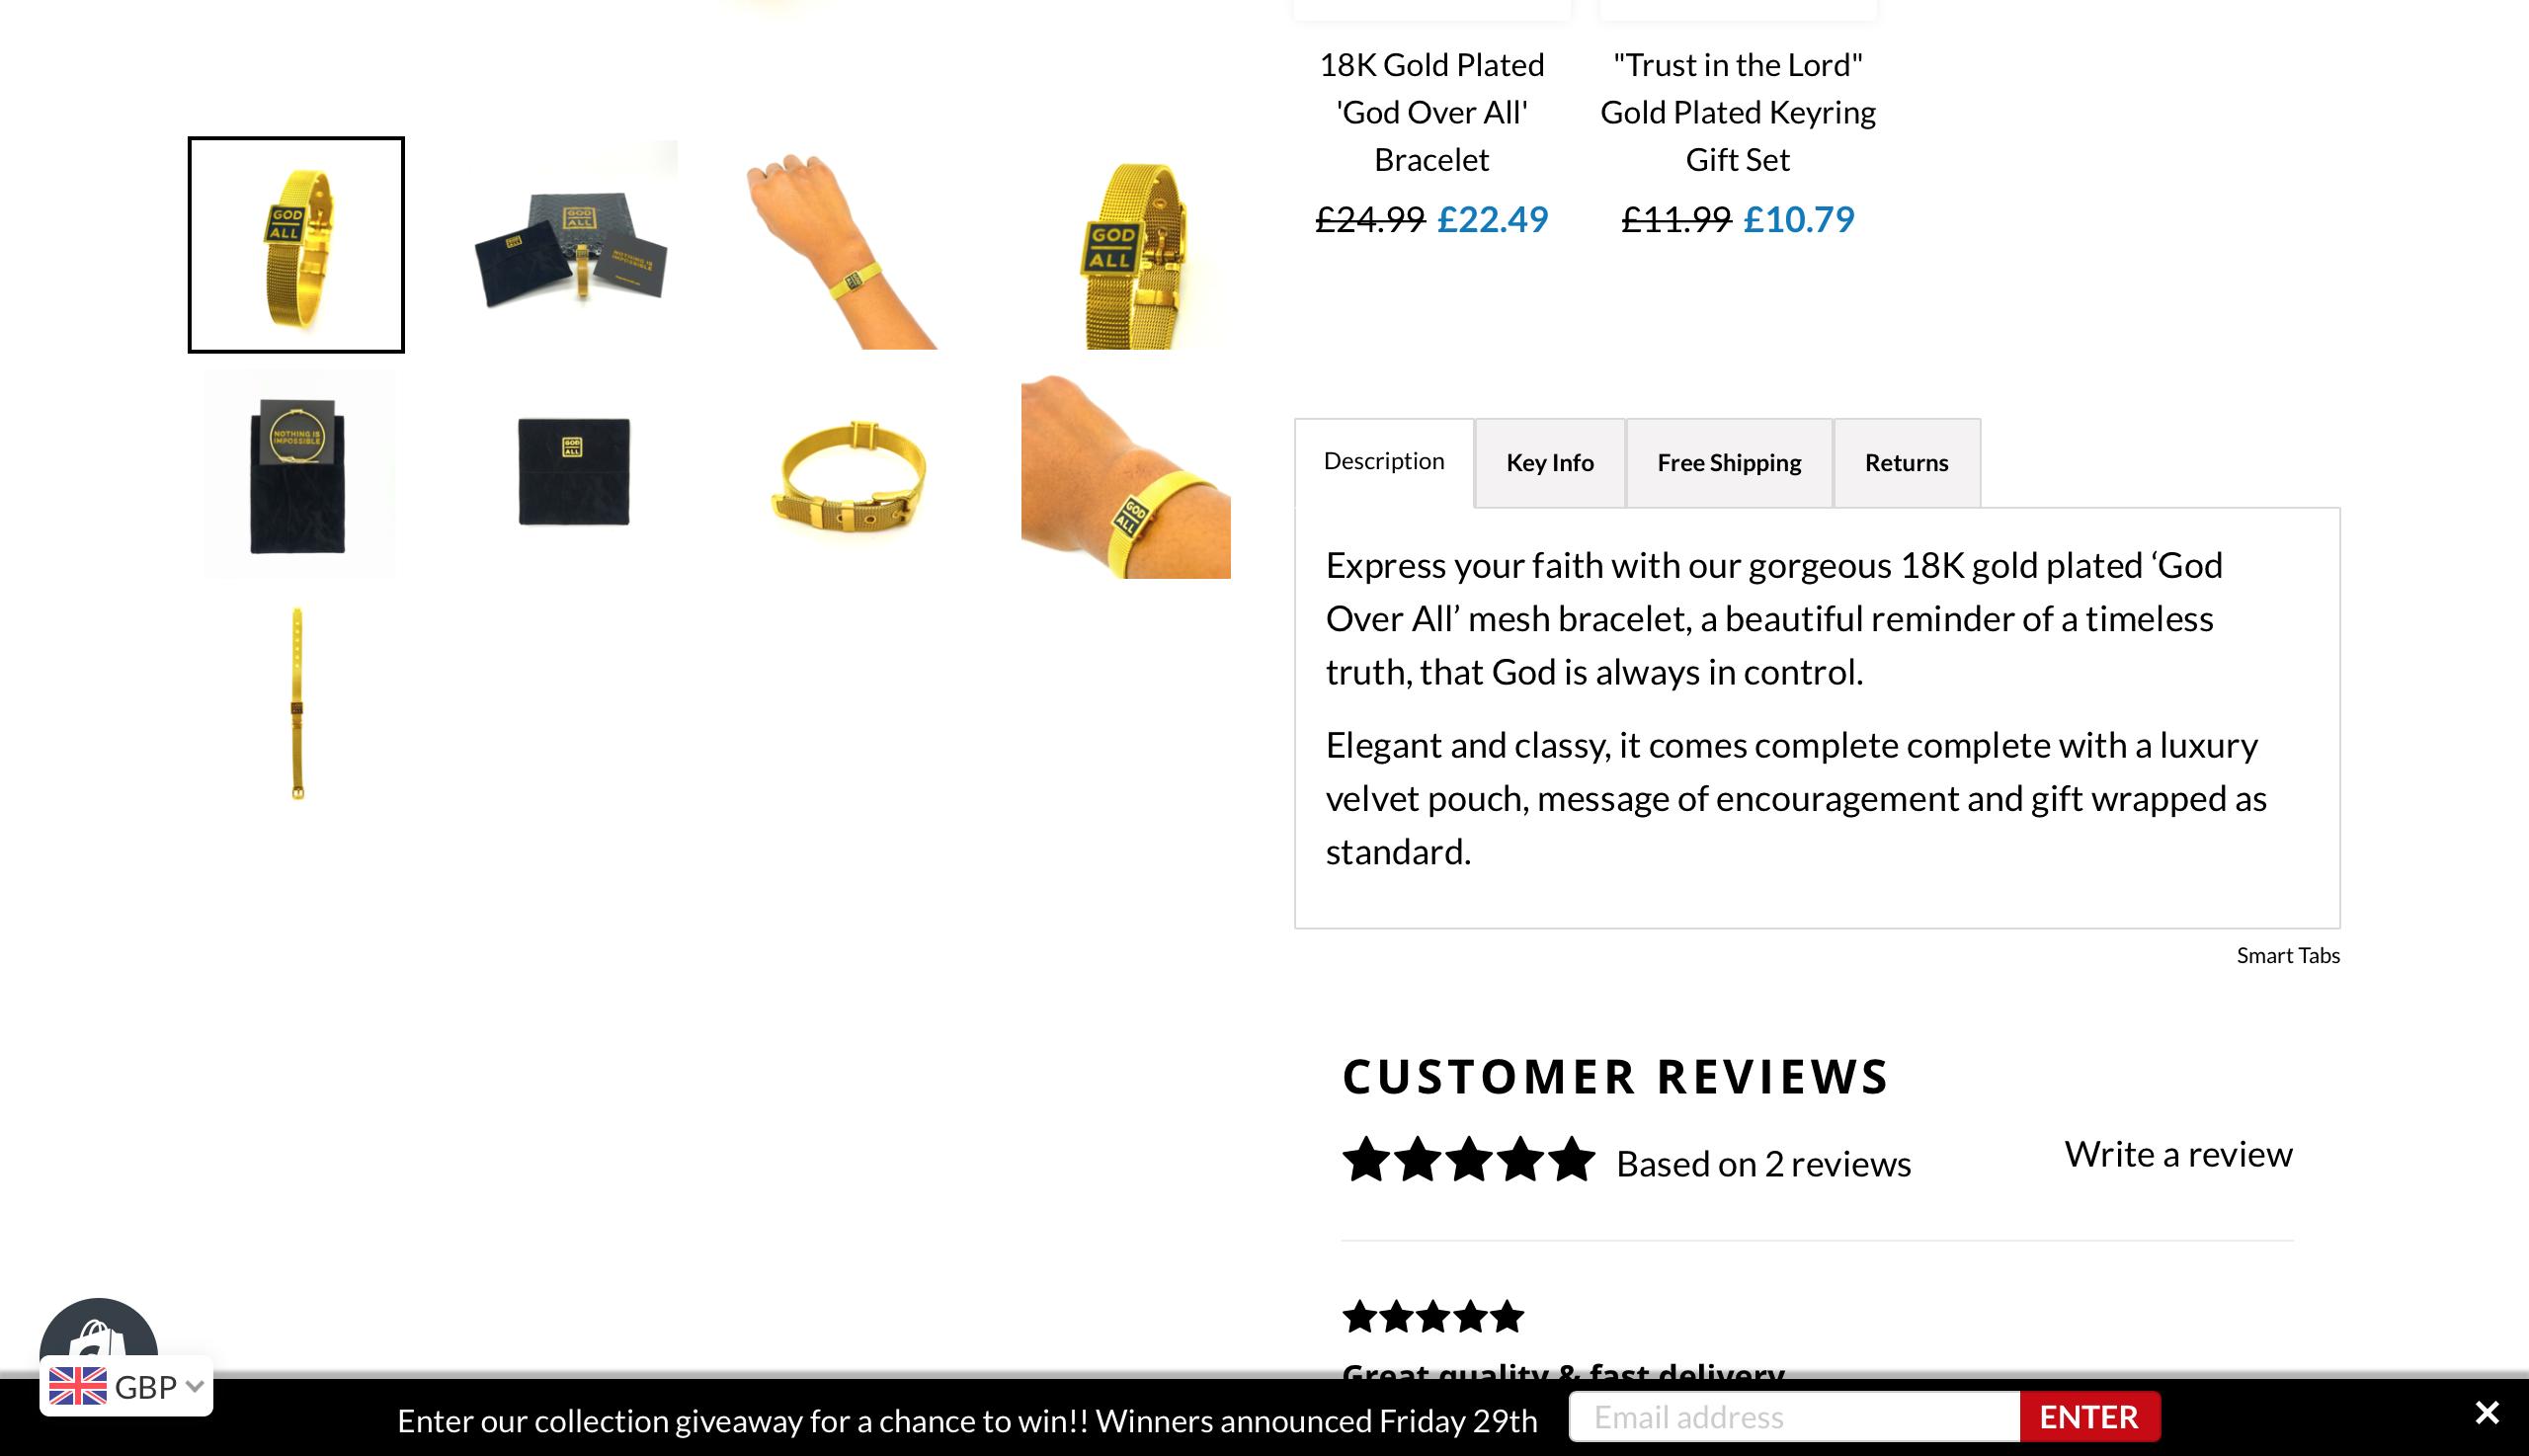 Website | The God Over All